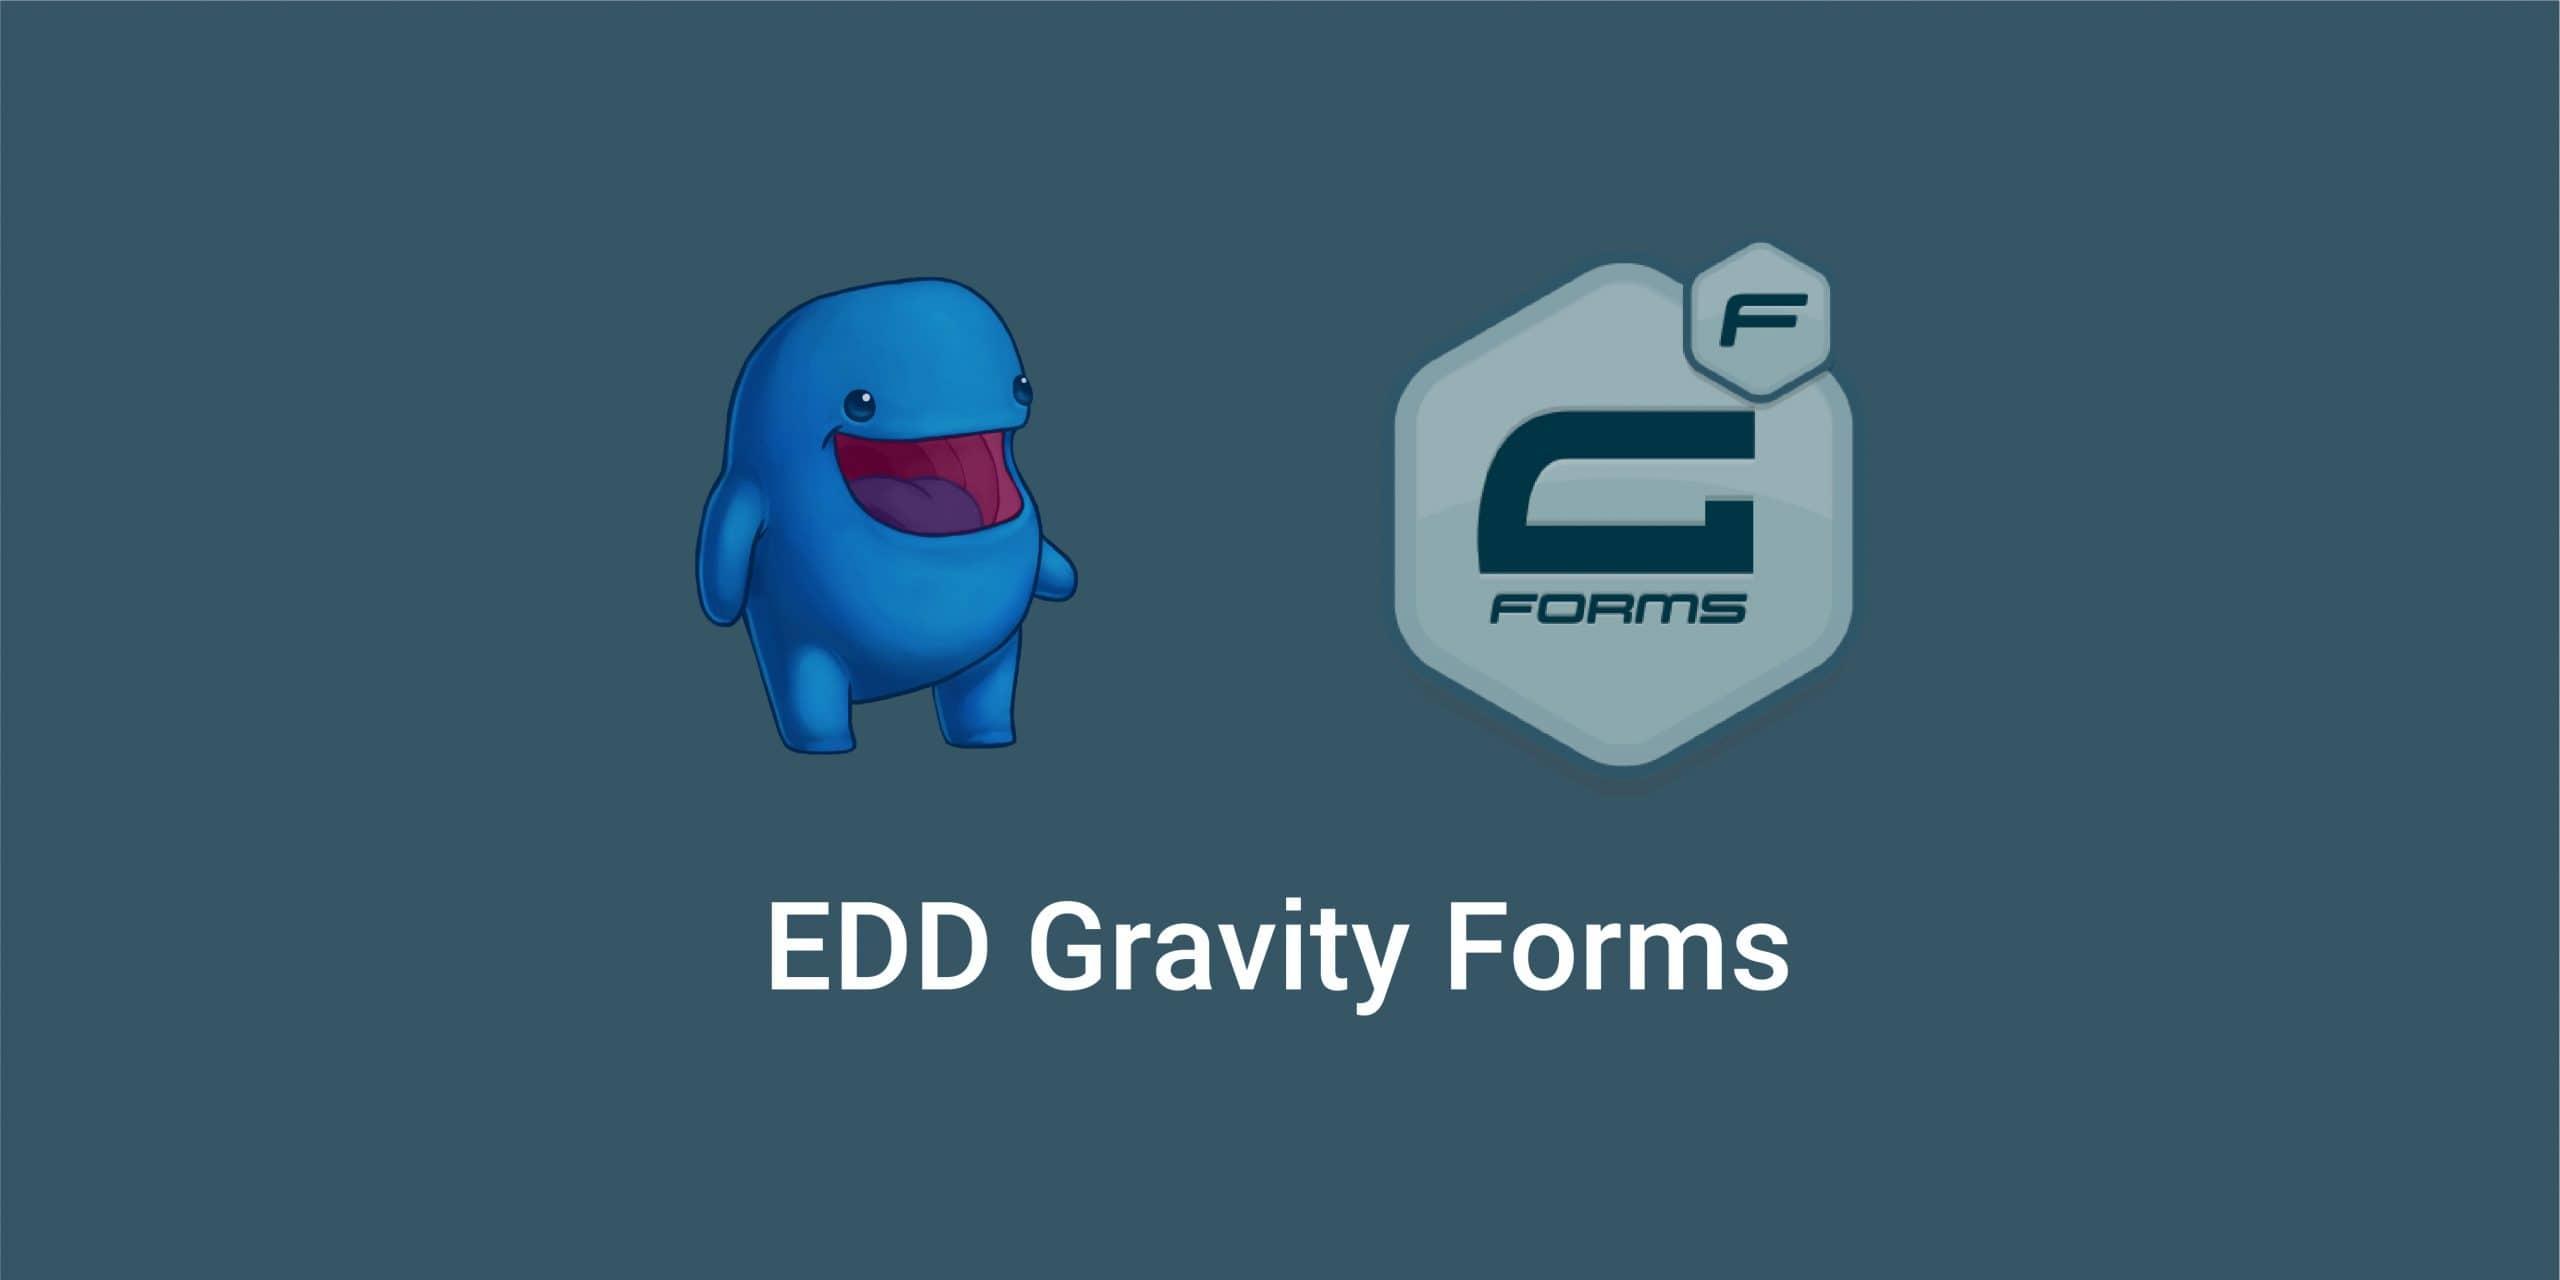 EDD Gravity Forms license check